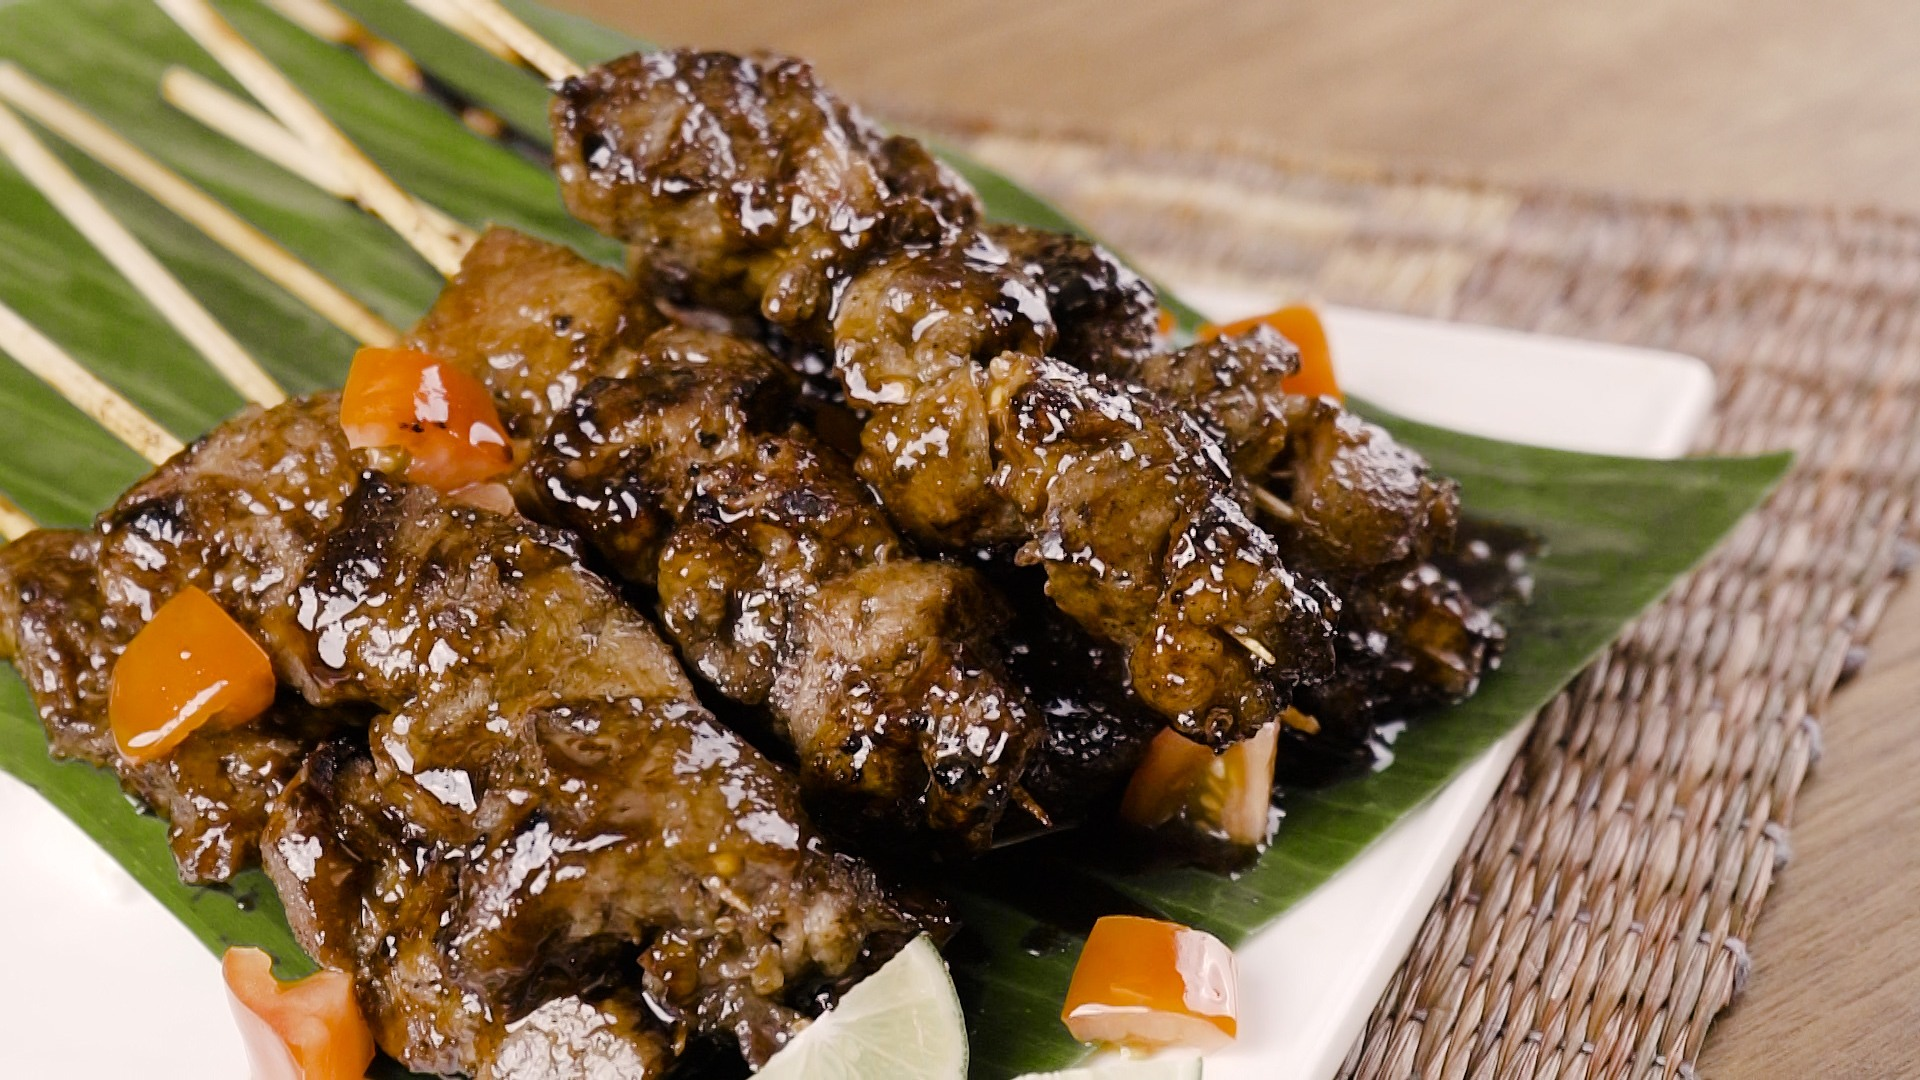 resep ayam bakar favorit quotes Resepi Ayam Bakar Basah Enak dan Mudah